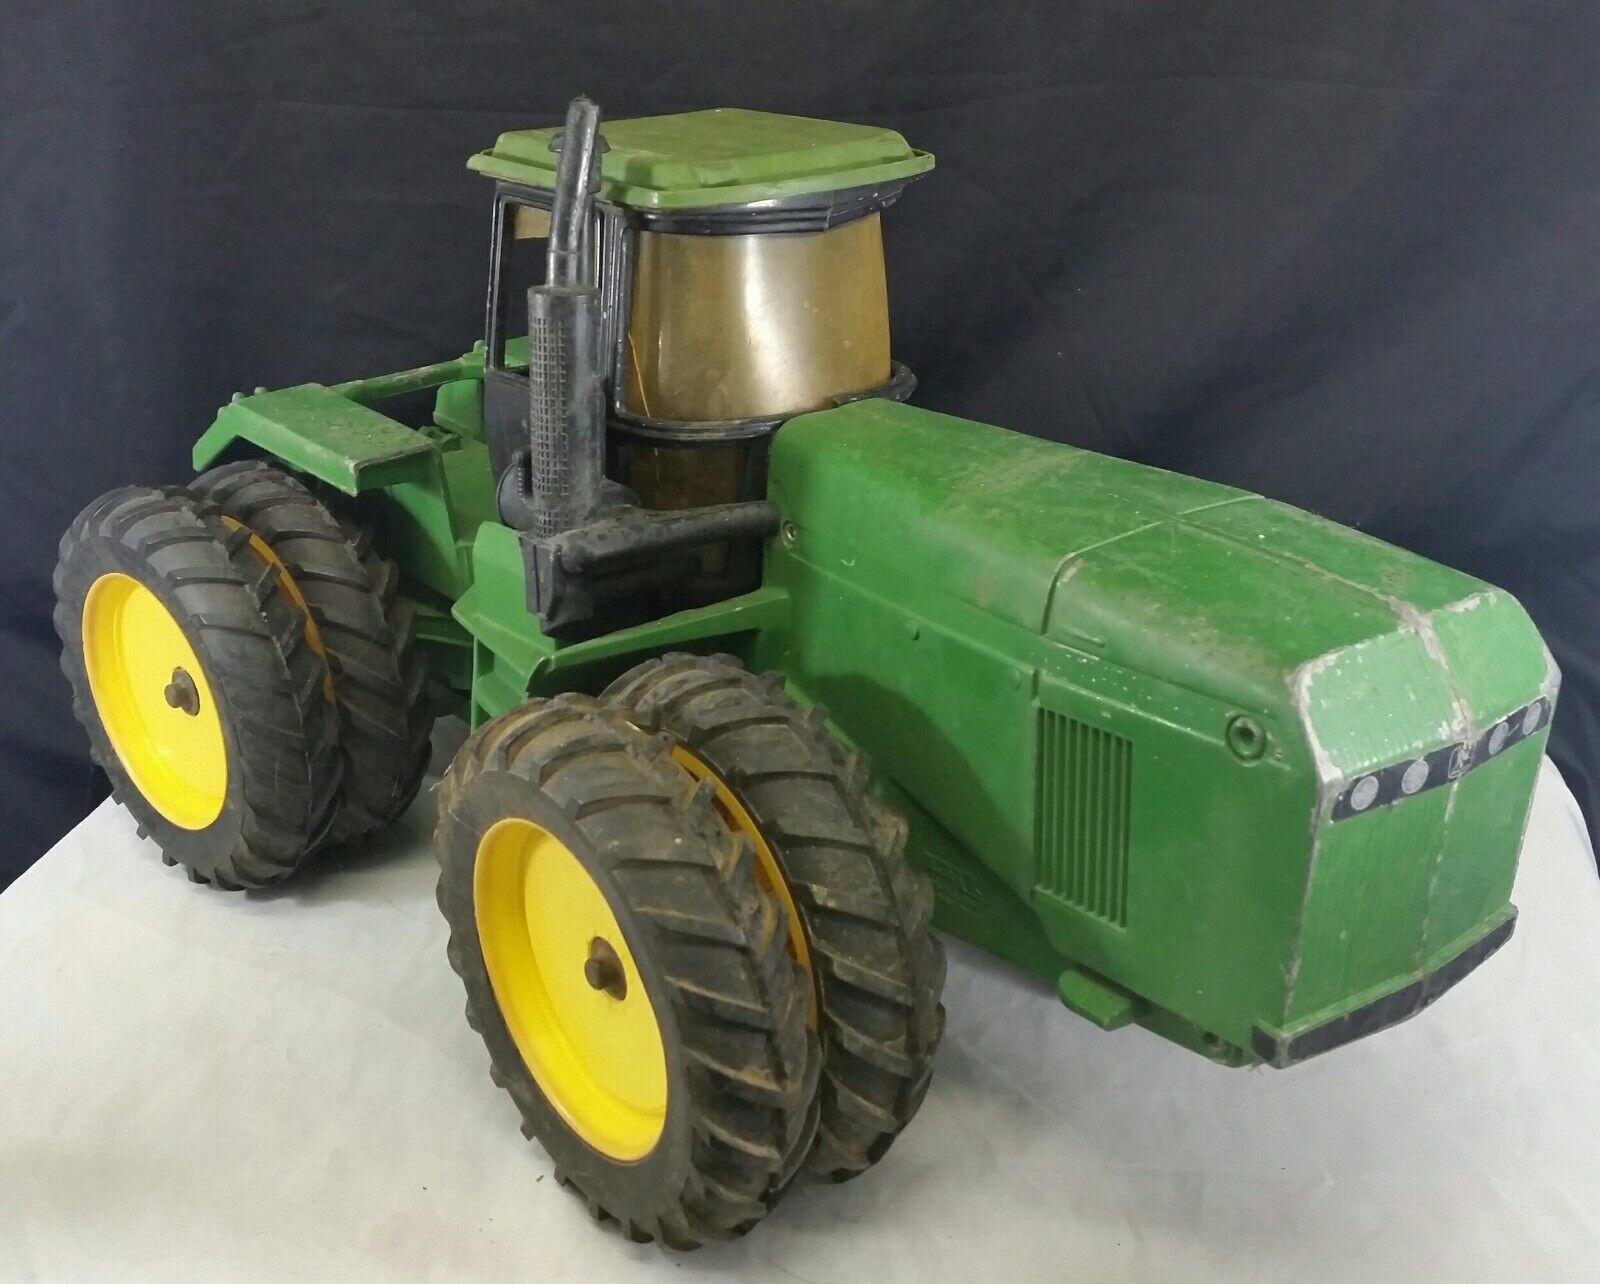 marcas de diseñadores baratos Usado Raro John Deere 8870 8870 8870 1 16 Tractor 1993 Juguete de Metal verde 4wd 16   de moda